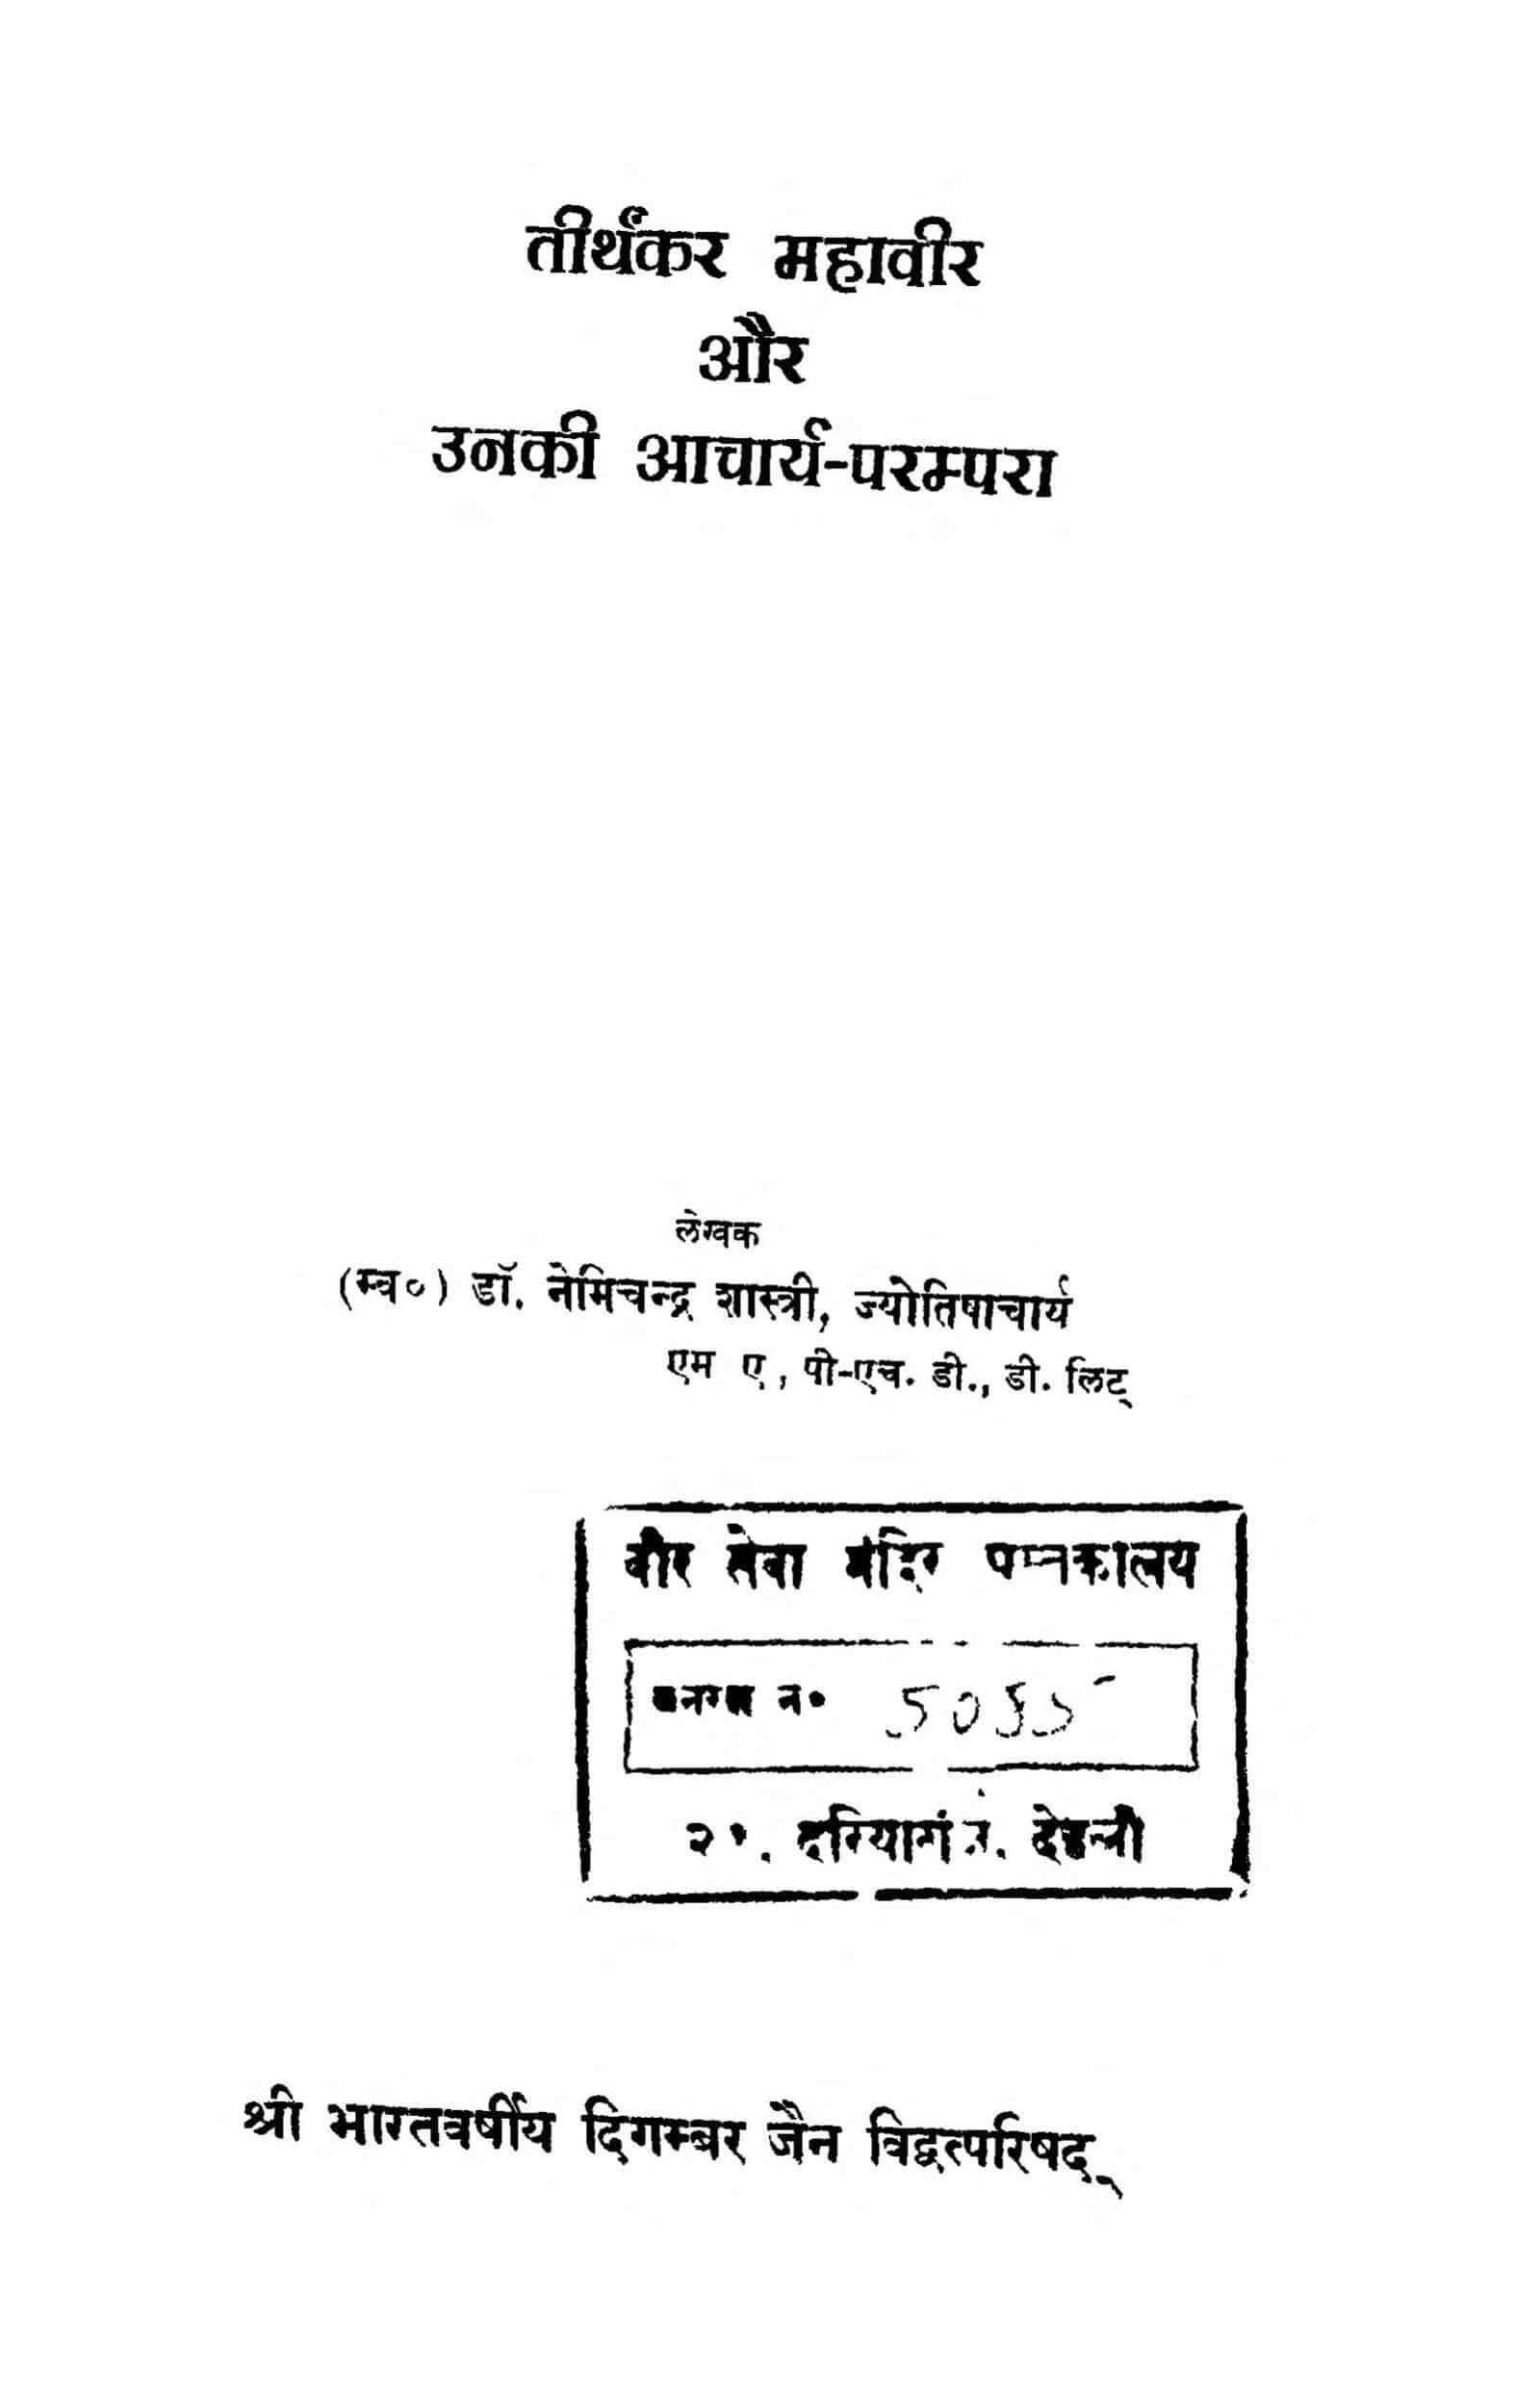 Book Image : तीर्थकर महावीर और उनकी आचार्य - परम्परा - Teerthakar Mahavir Aur Unki Aacharya Prampara